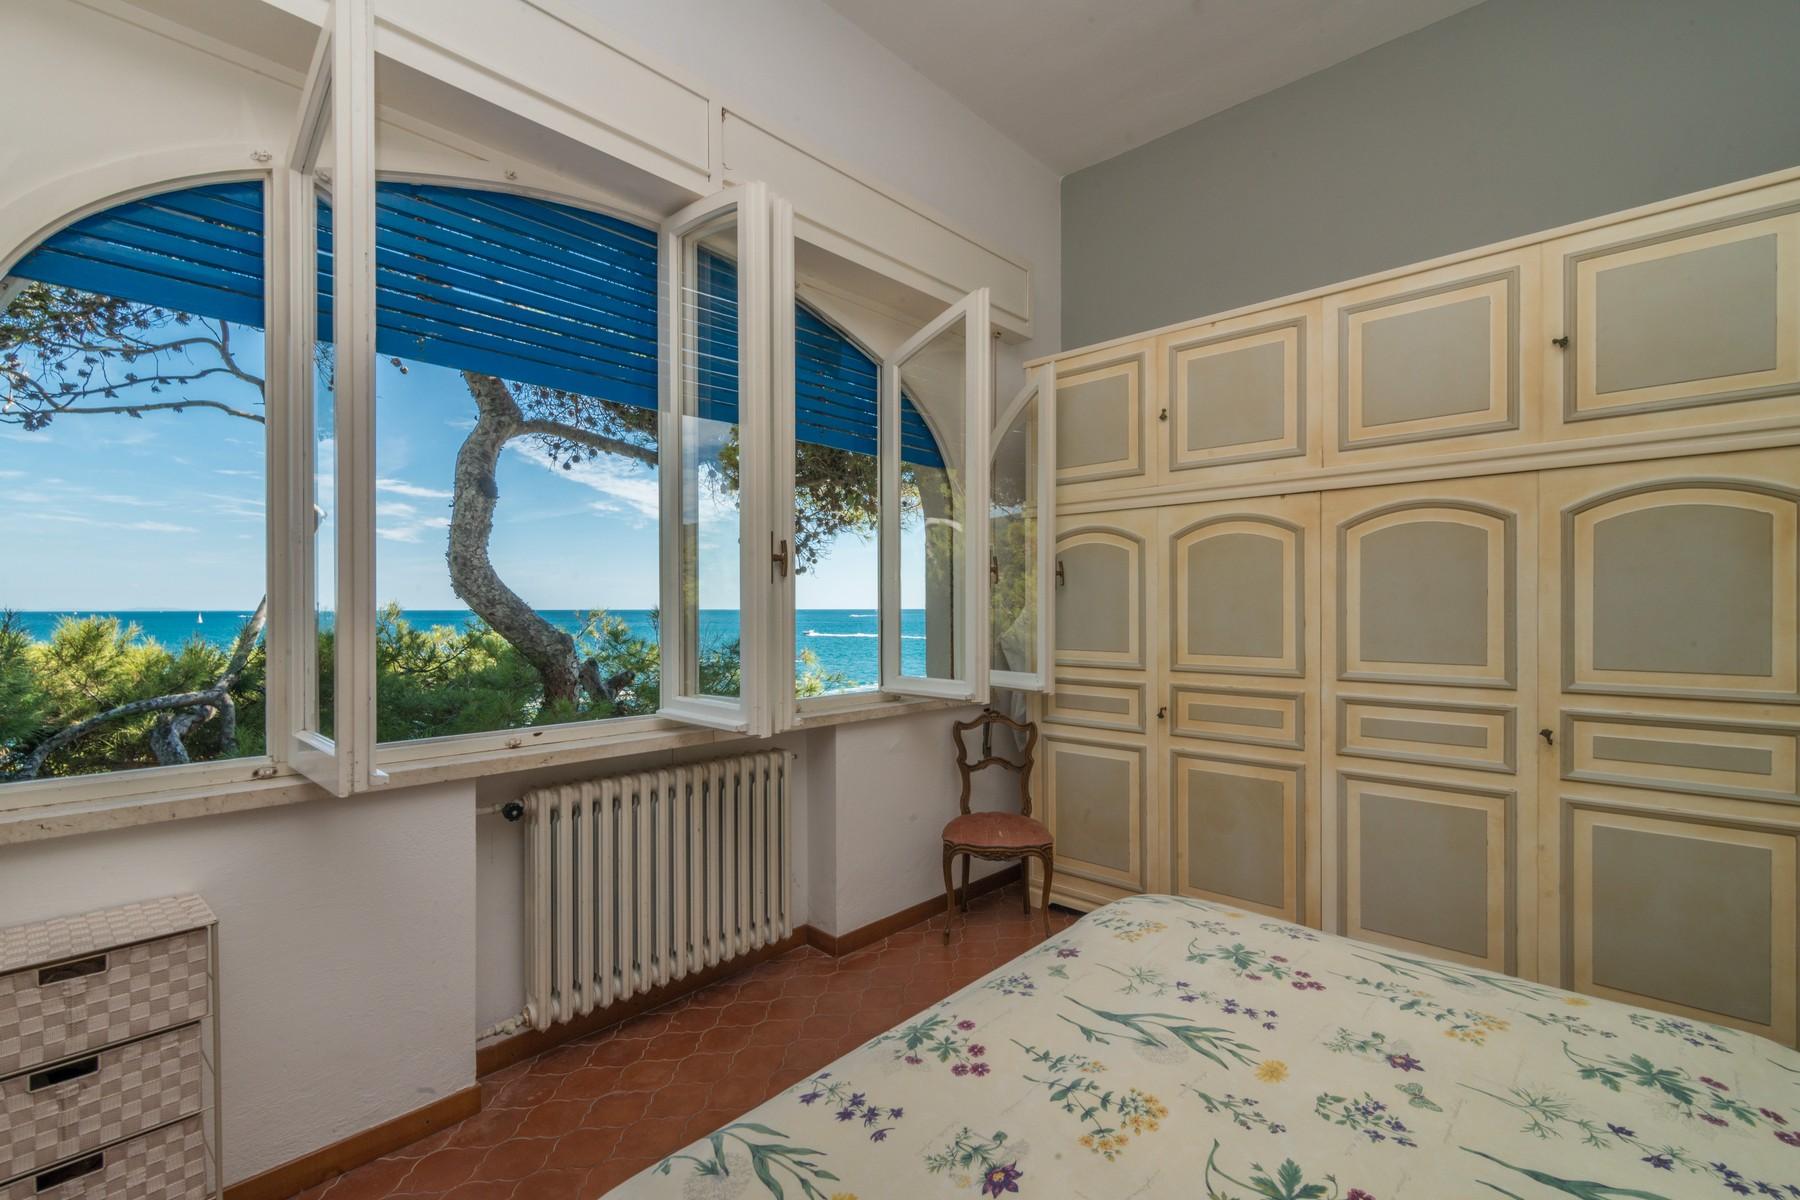 Additional photo for property listing at Villa with private garden and pieds dan l'eau Via Carpanini Lerici, La Spezia 19032 Italy